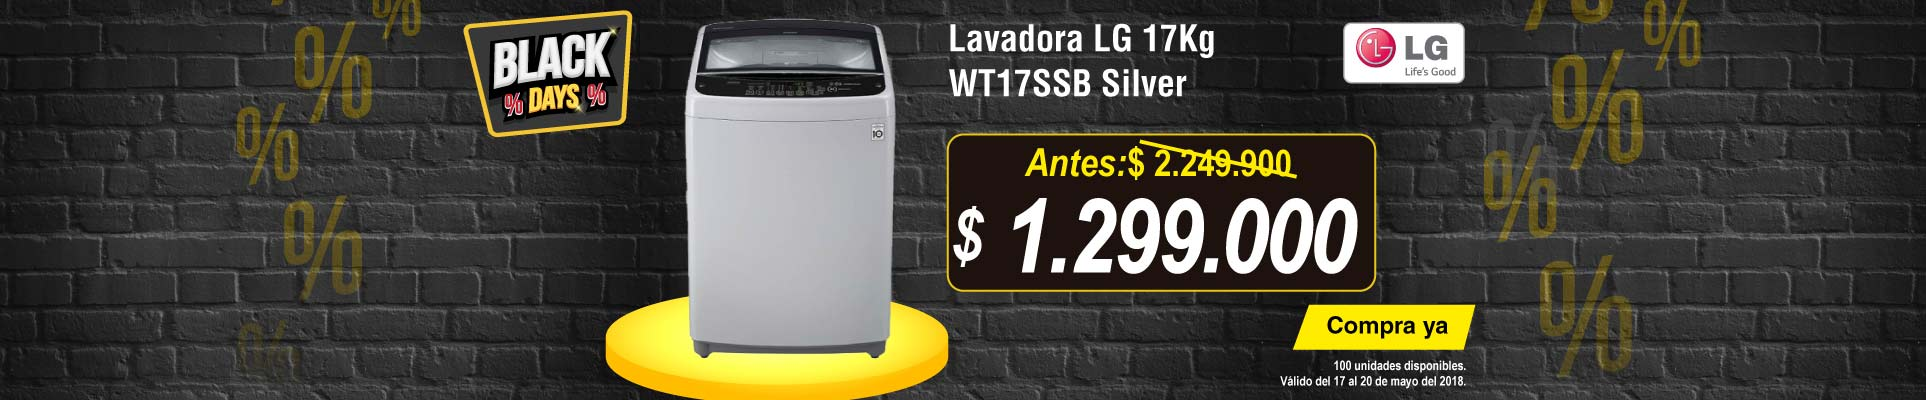 PPAL ALKP-6-LB-Lavadora LG 17Kg WT17SSB Silver-prod-Mayo17-20